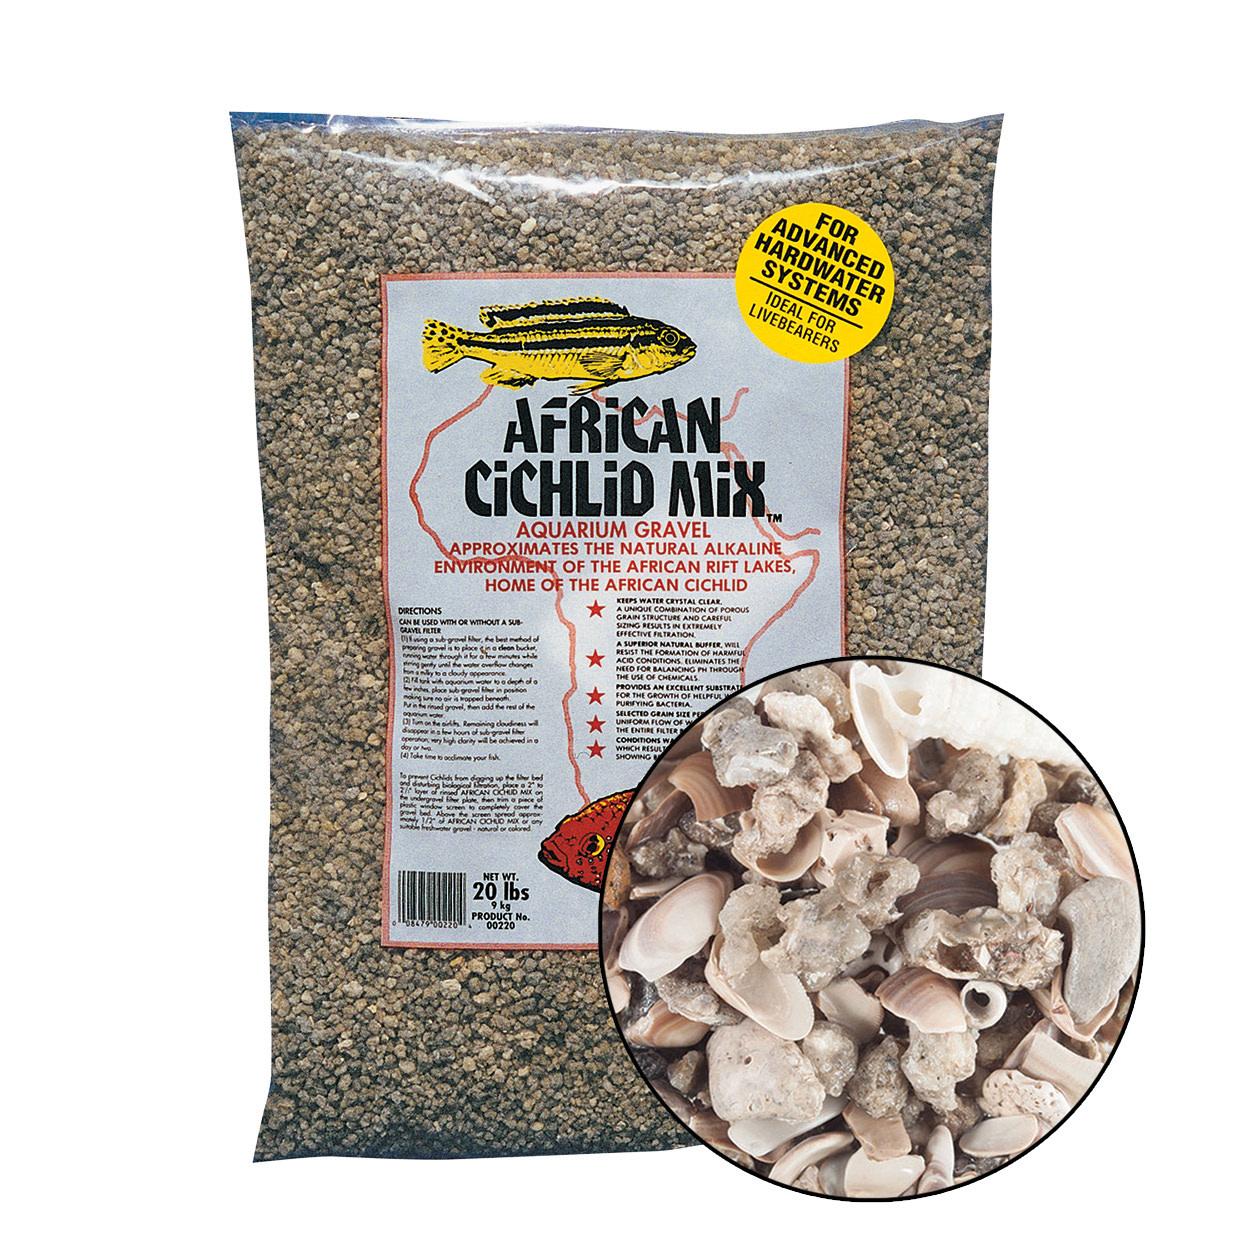 CaribSea CaribSea African Cichlid Mix Original 20 lb